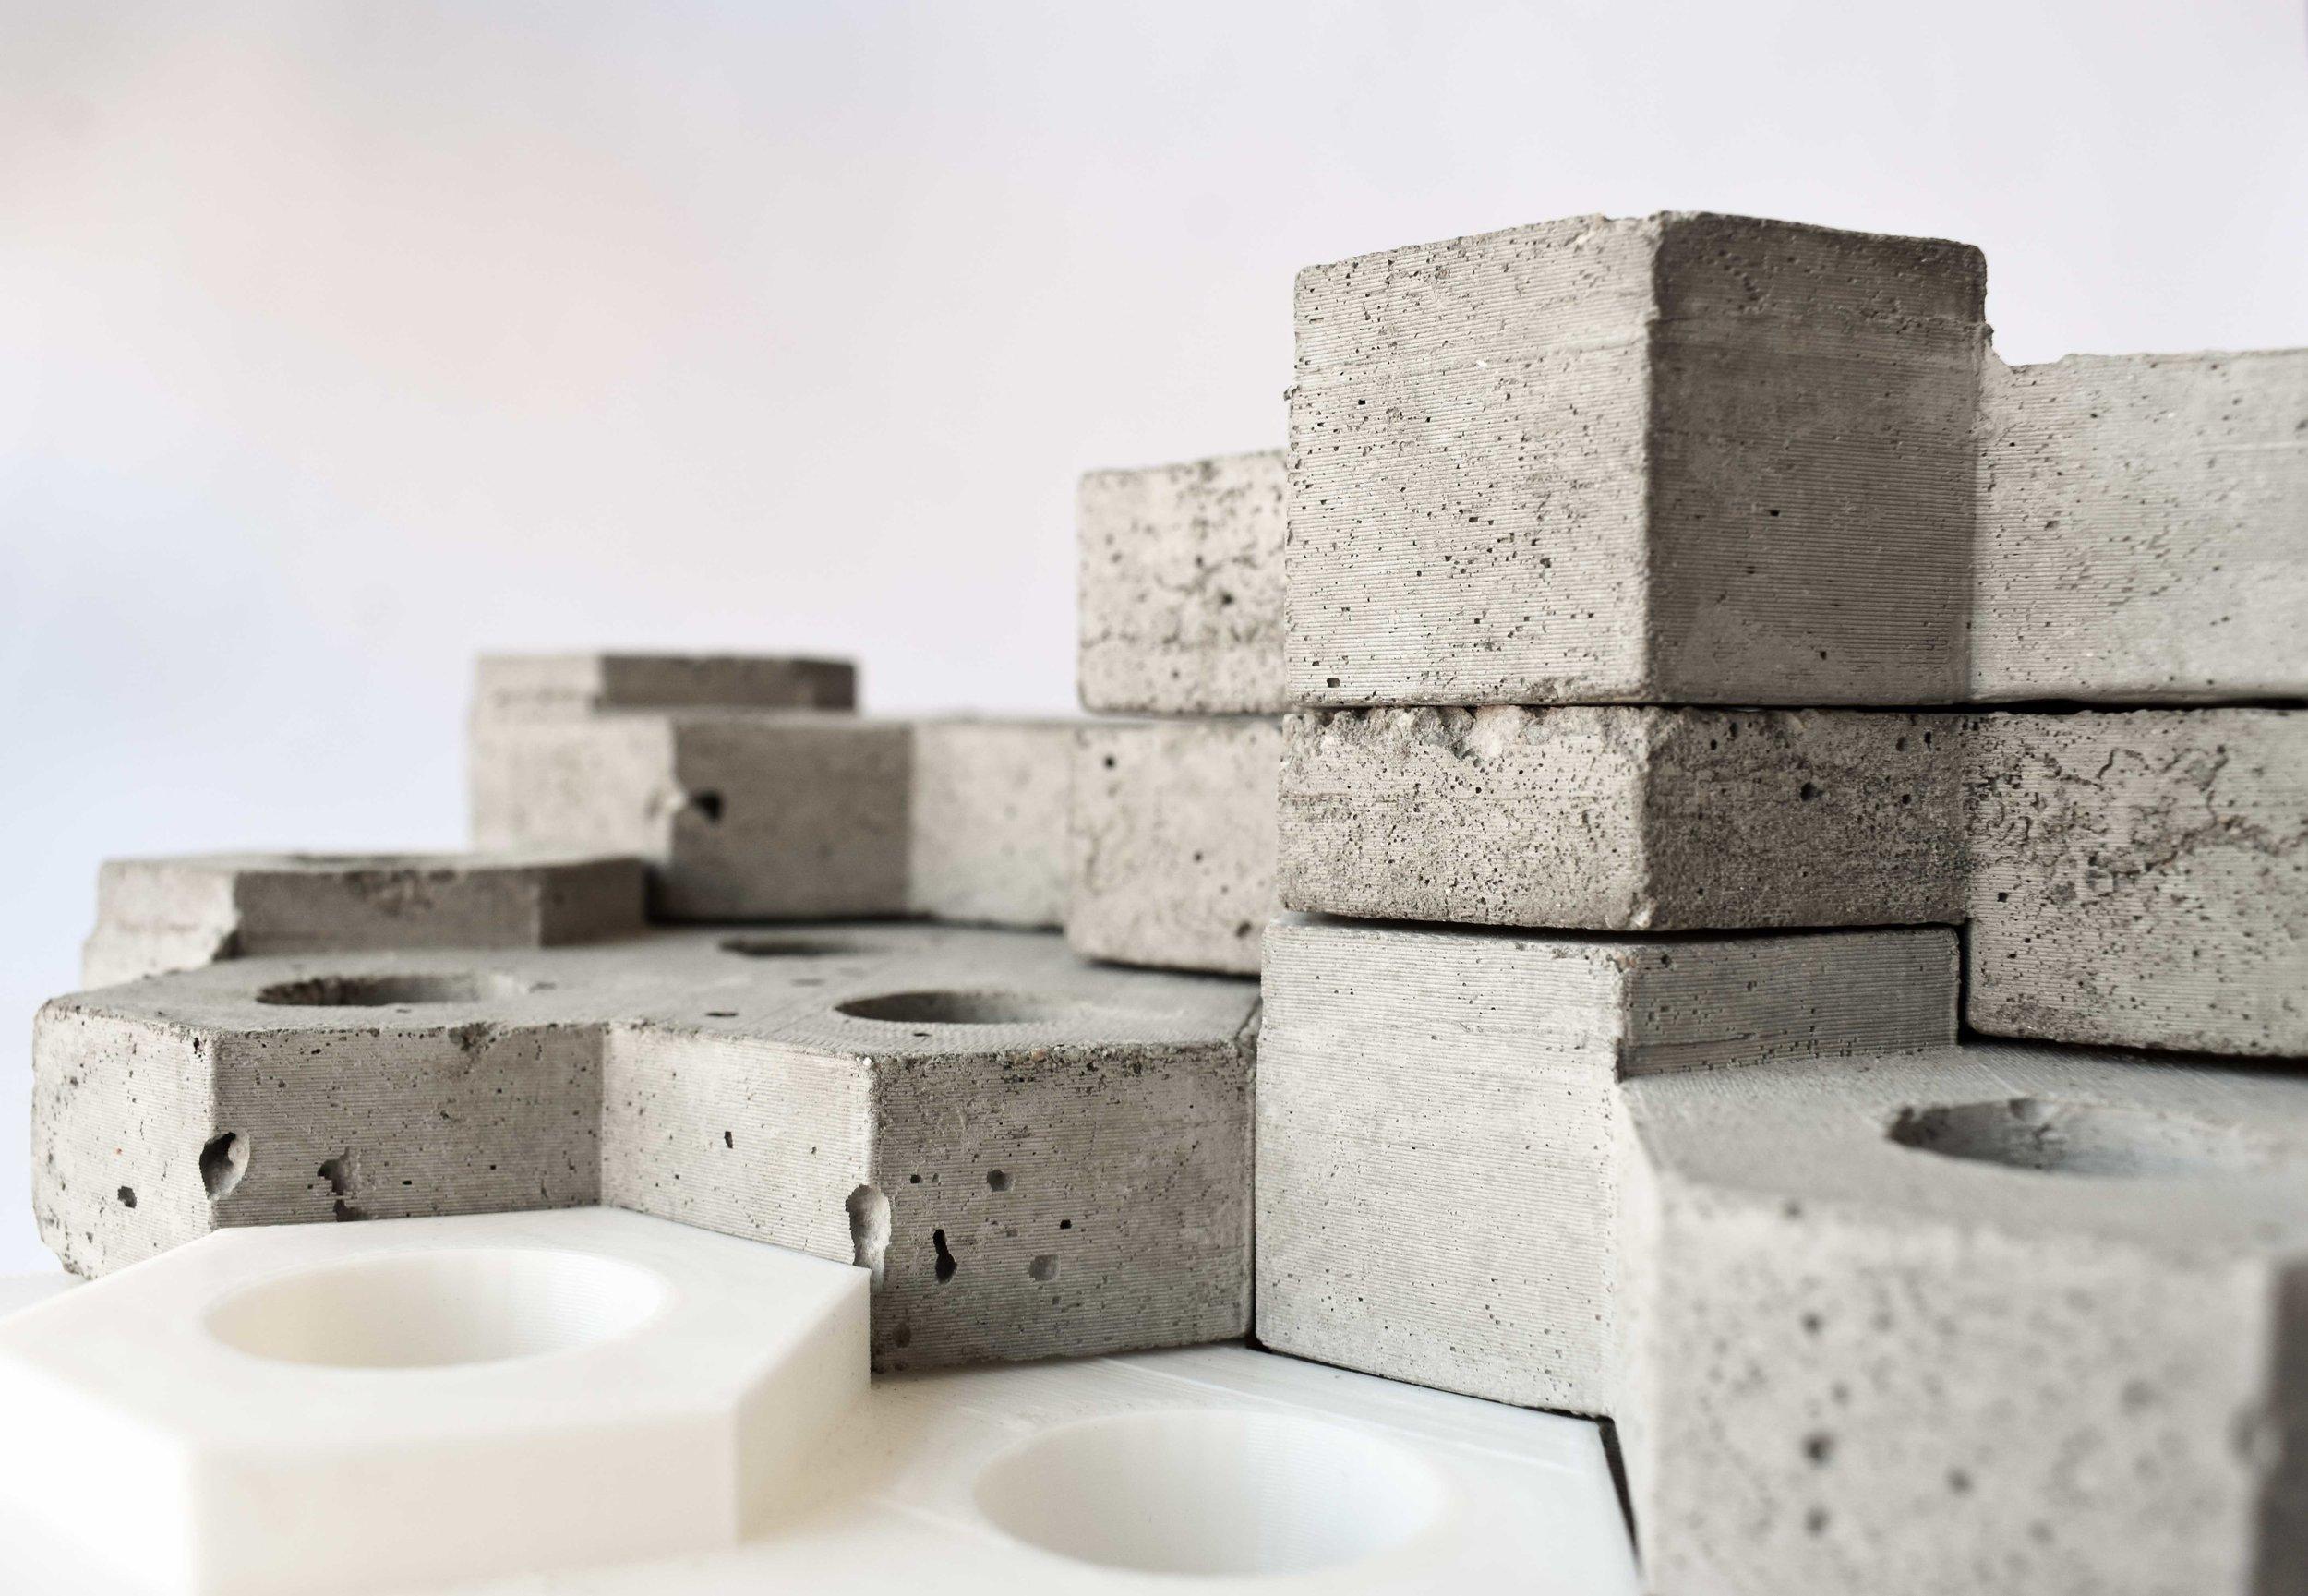 Concrete / 3D Printed Modules